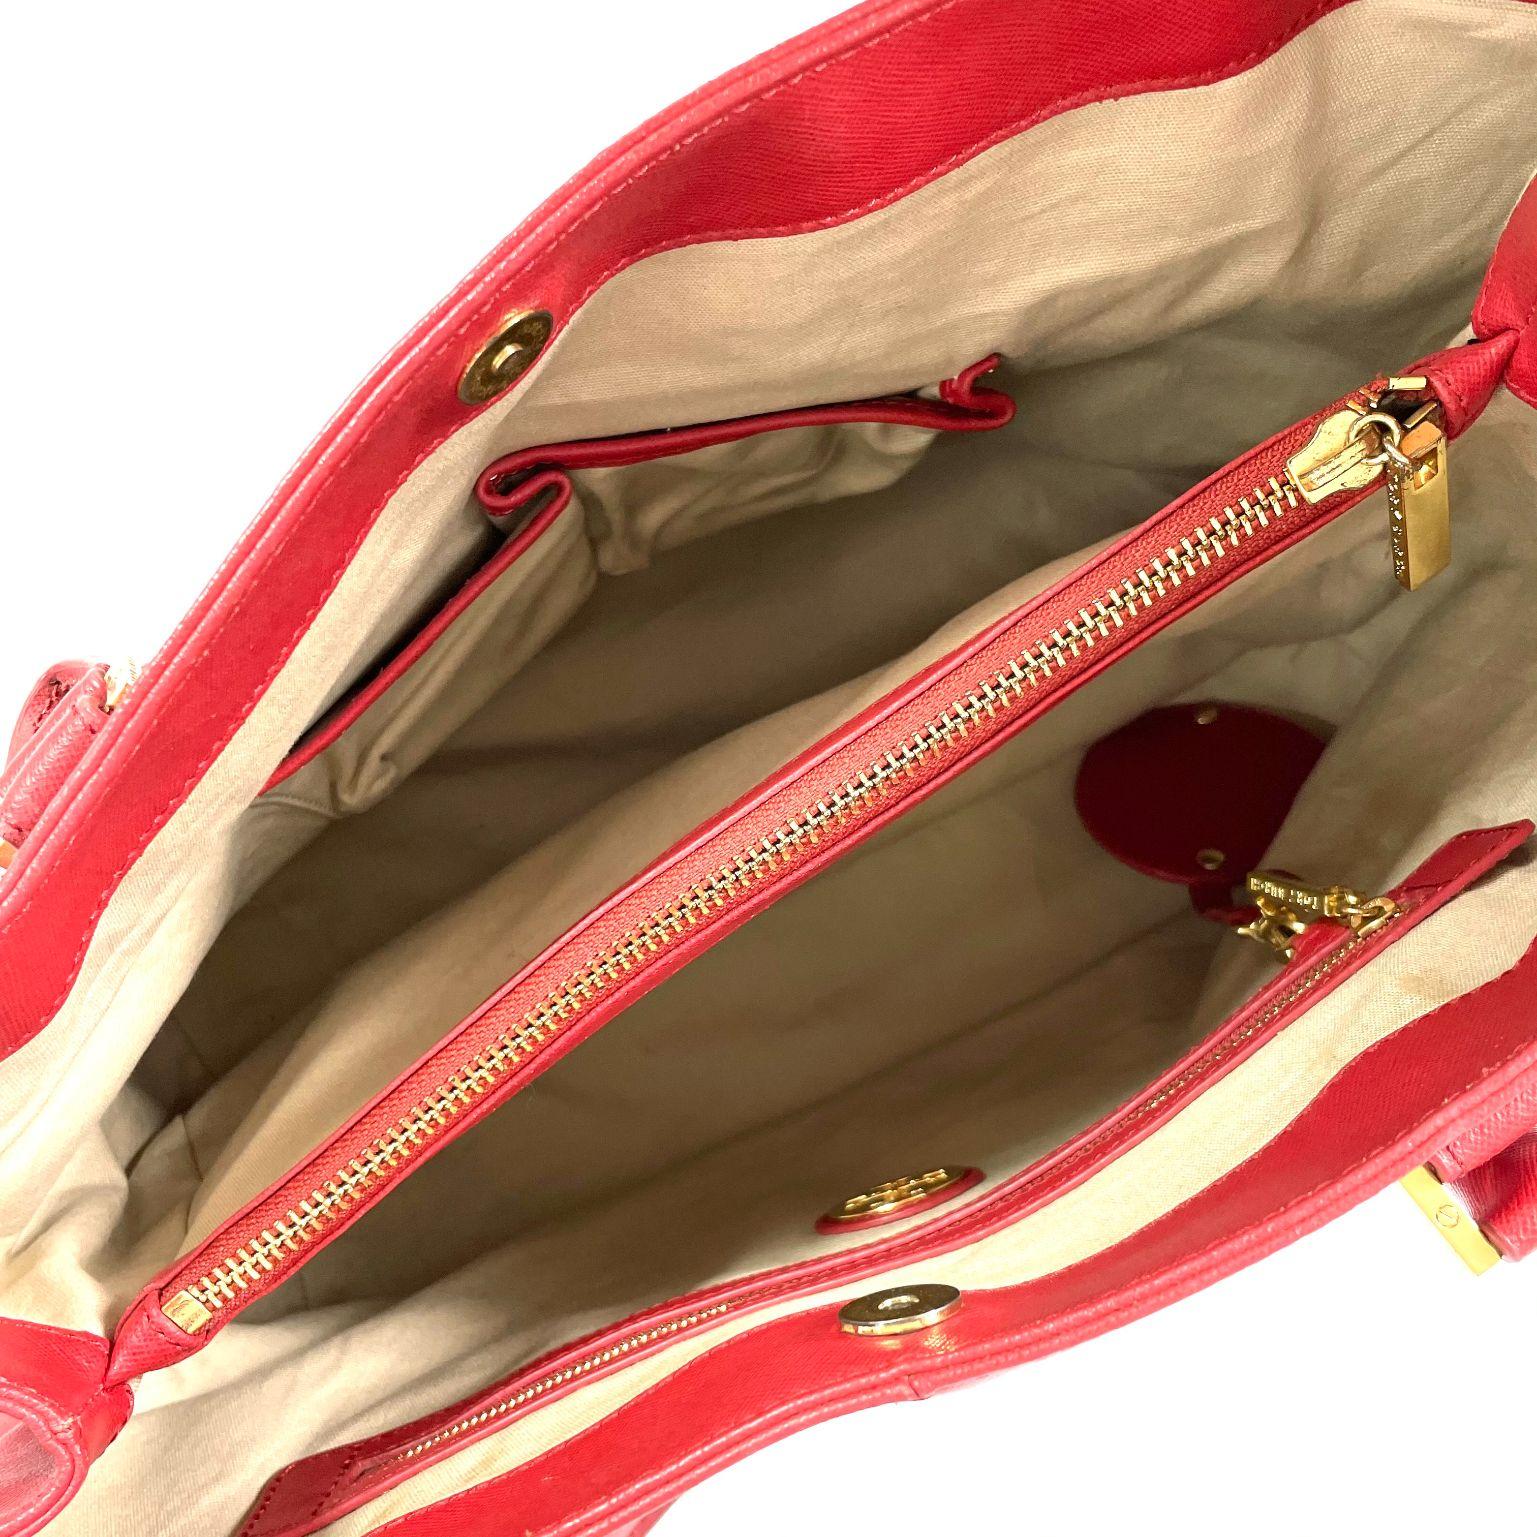 Bolsa Tory Burch Tote Vermelha